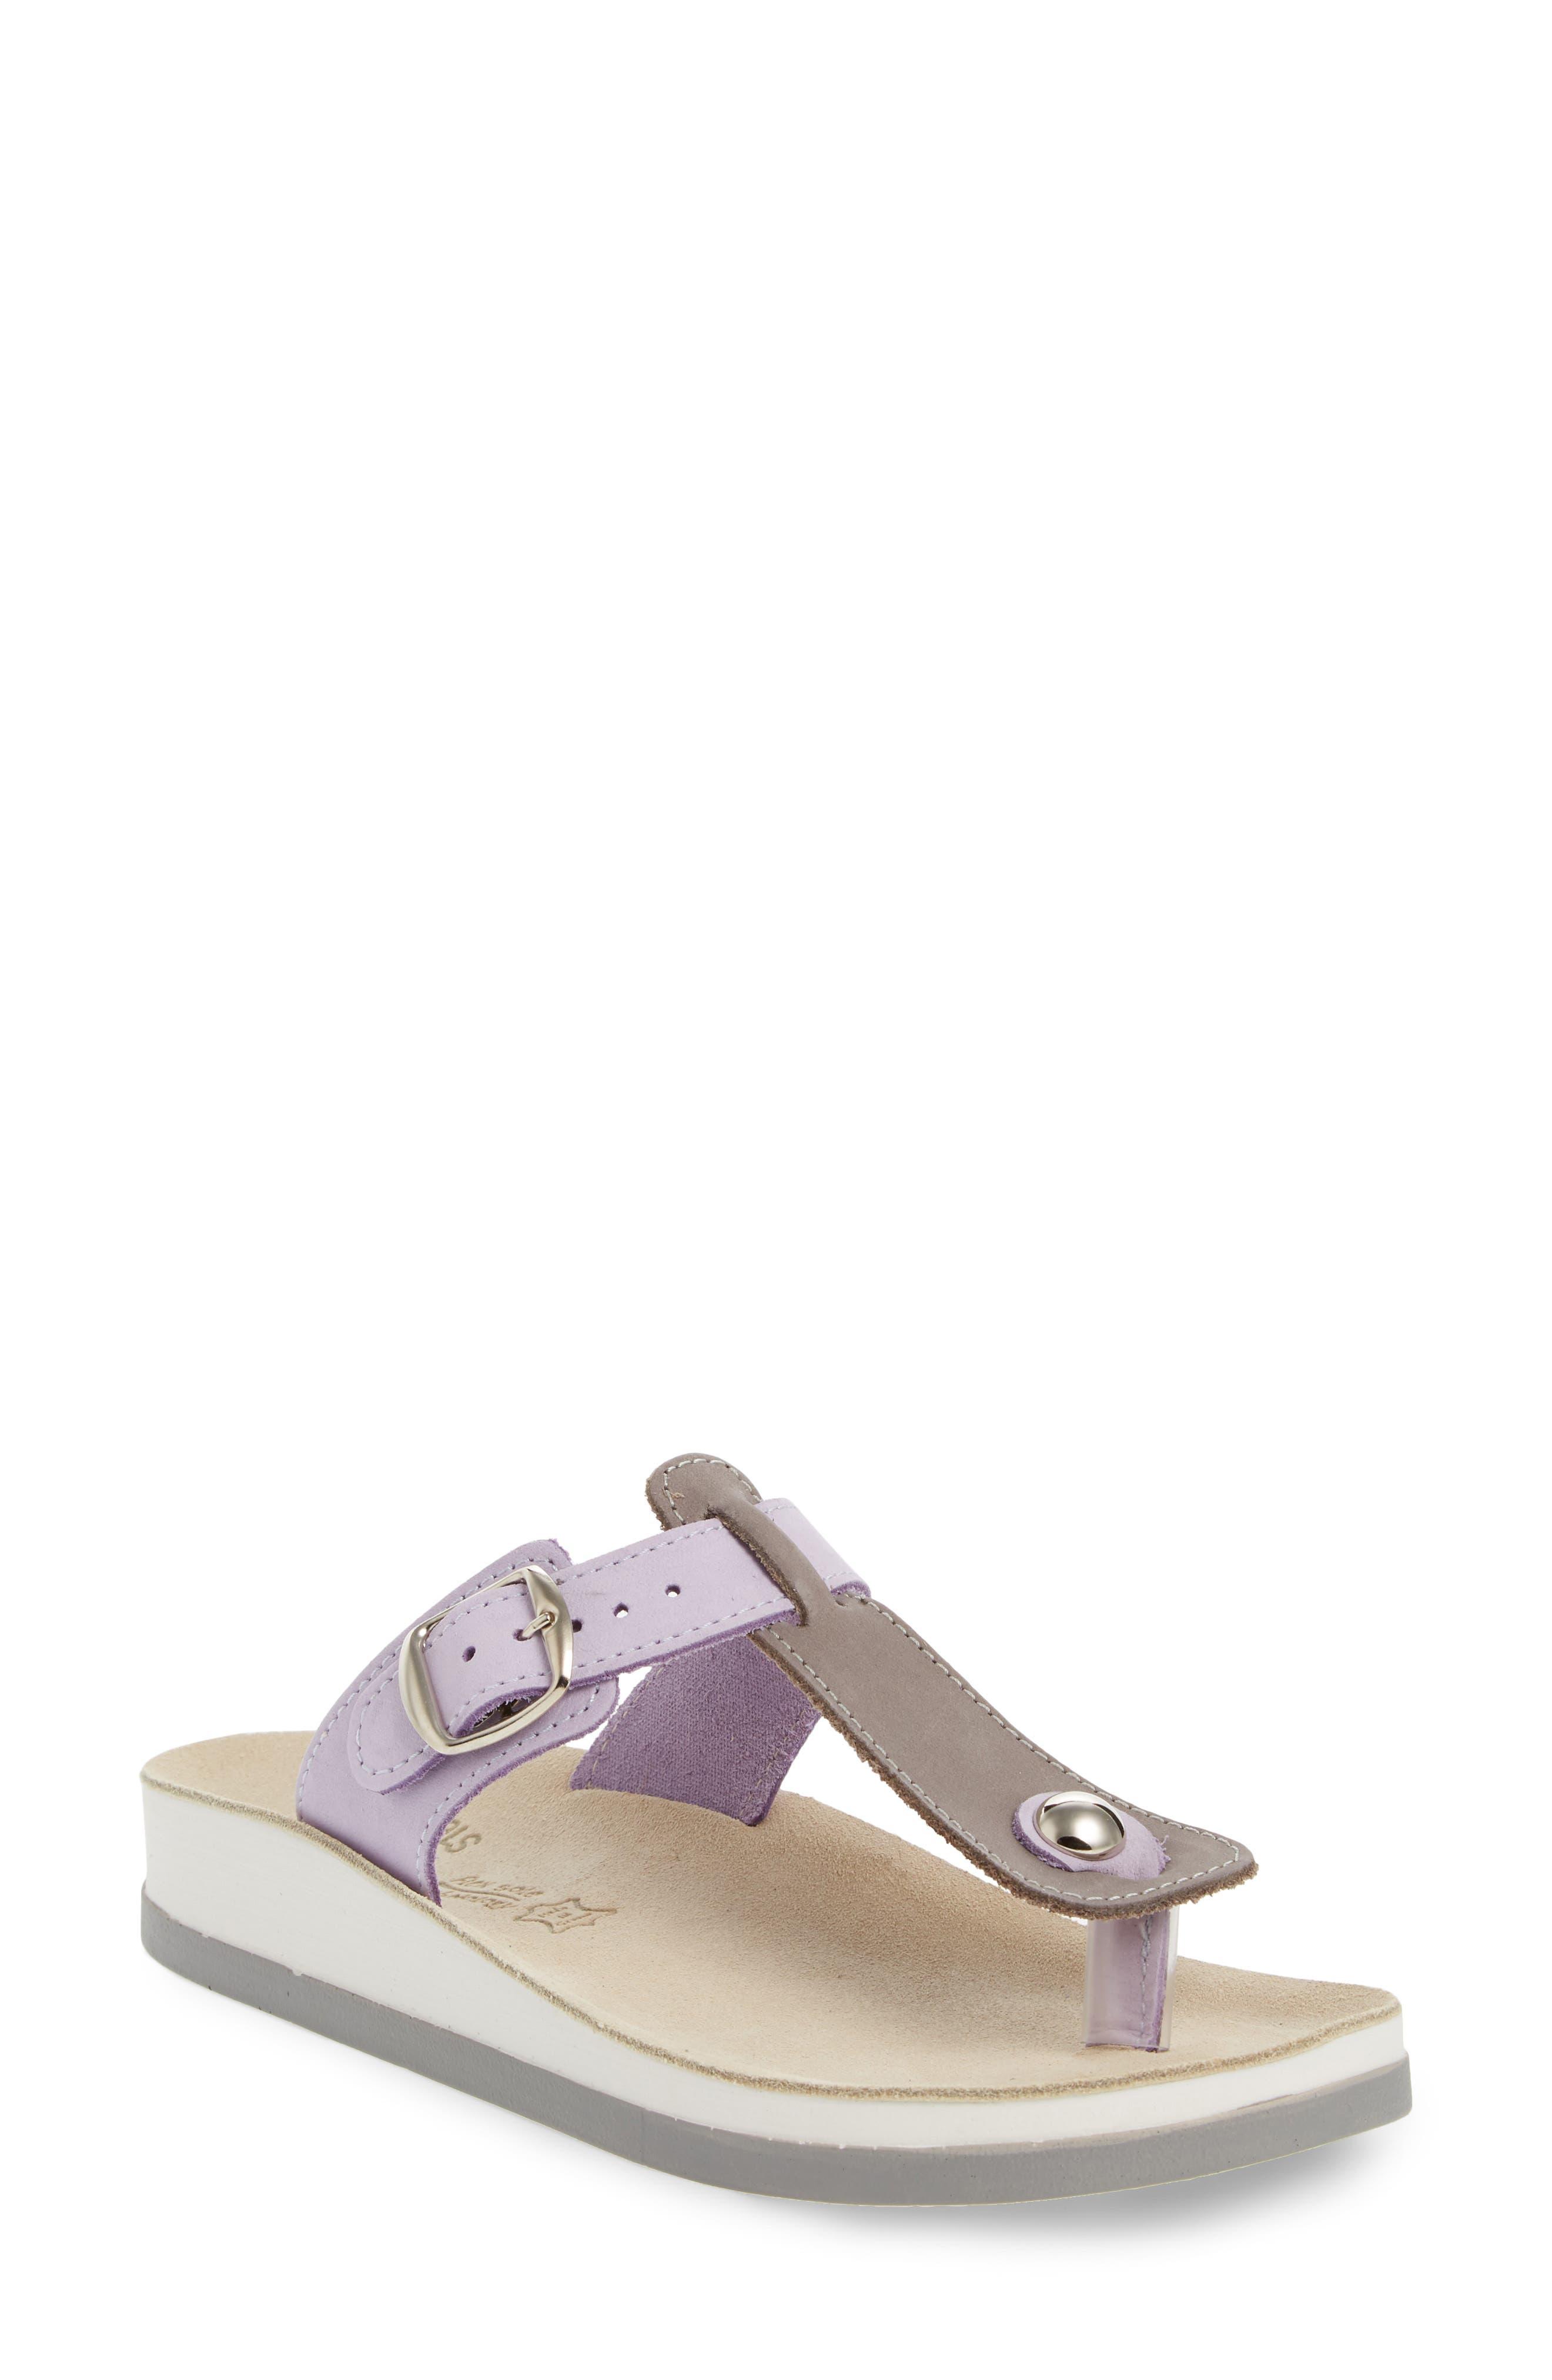 Viola Sandal,                         Main,                         color, 020